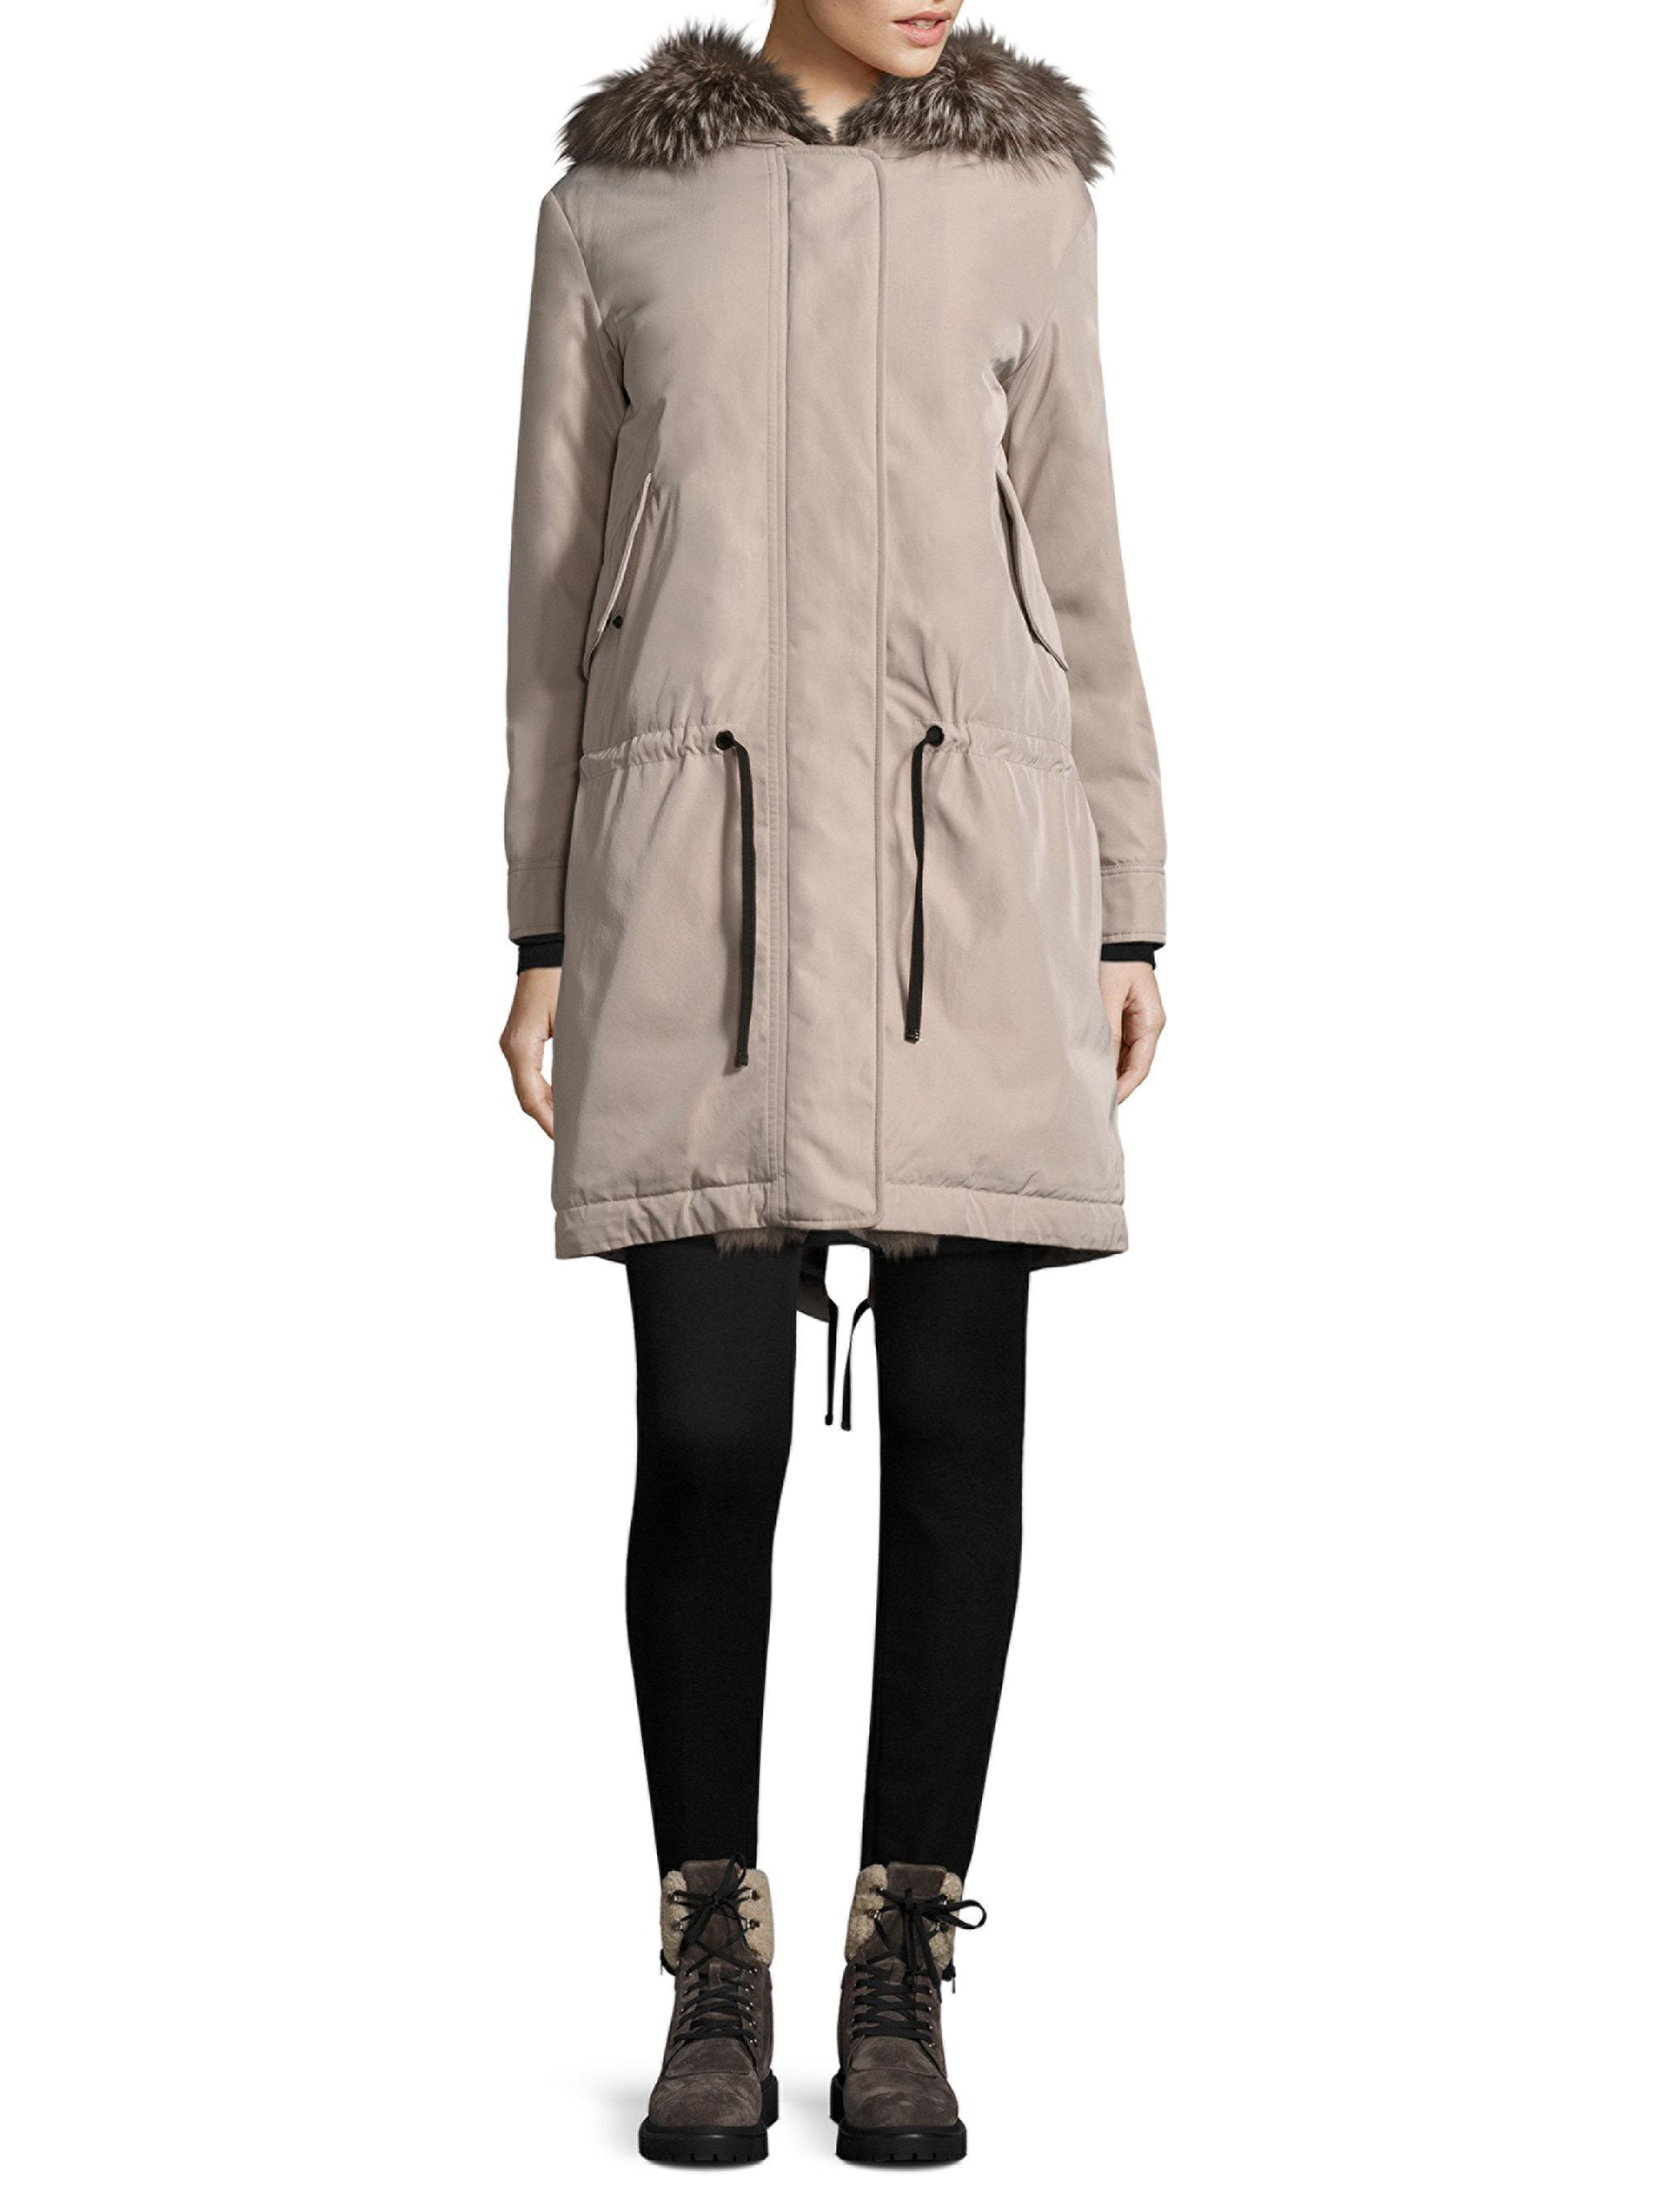 Moncler. Women's Natural Veronika Blue Frost Fox Fur Jacket